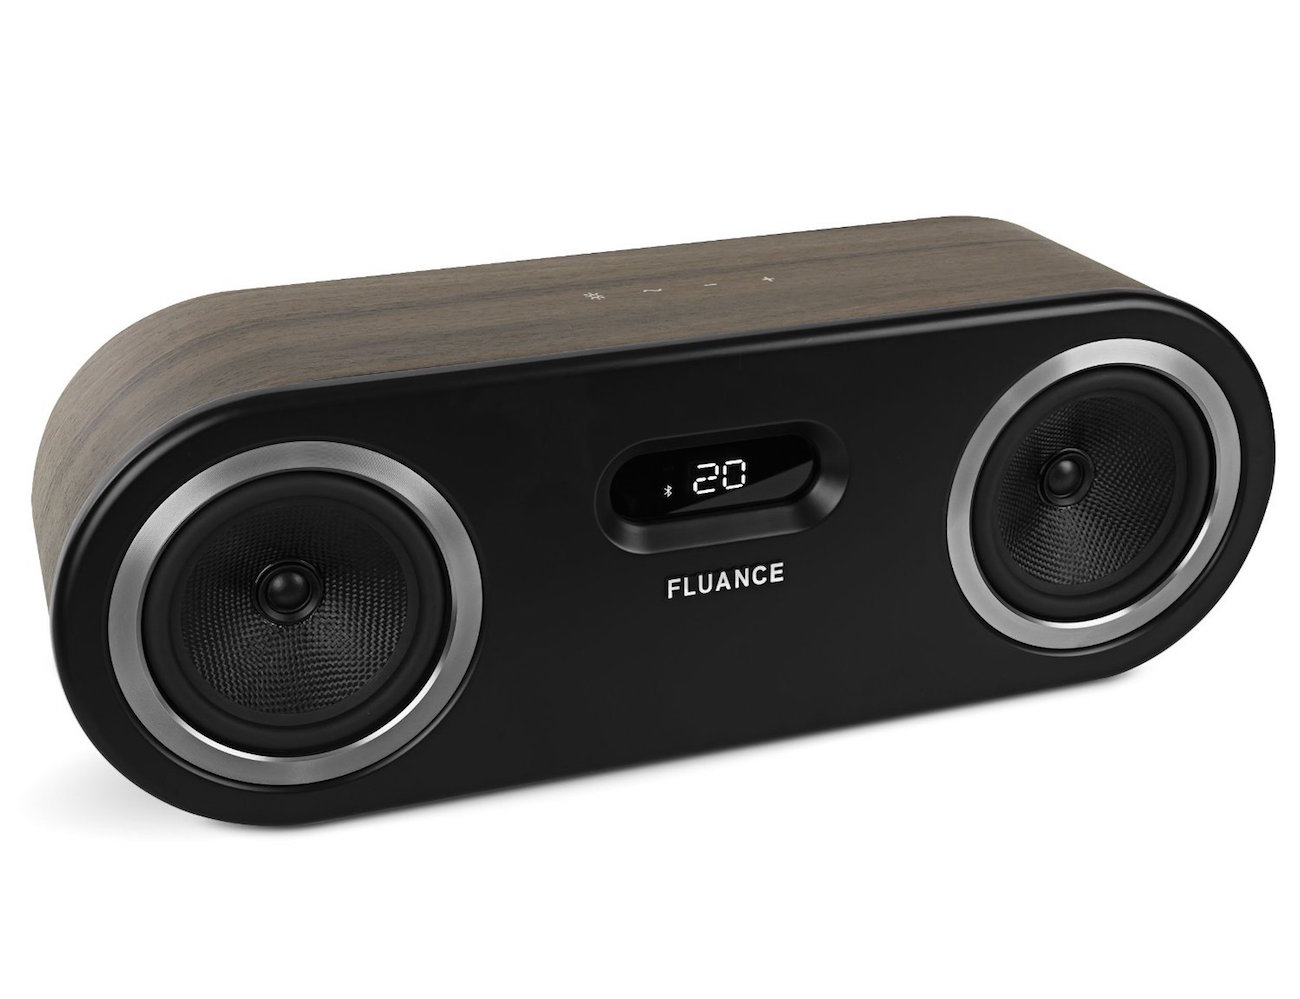 fluance-fi50-high-performance-bluetooth-wood-speaker-system-04